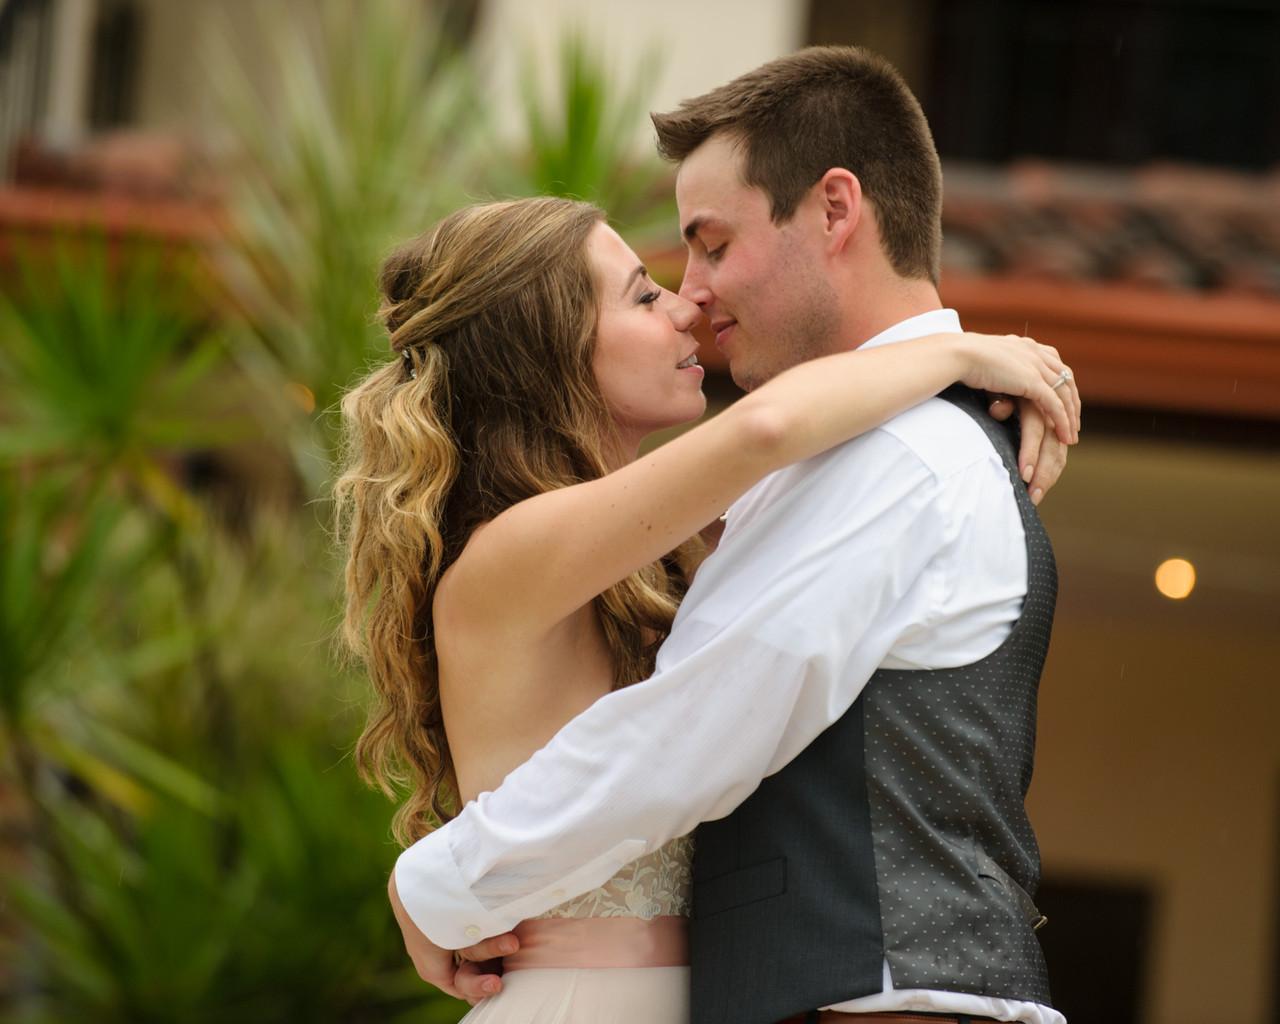 Bride and groom lost in a kiss at Villa Tranquila in Hacienda Pinilla